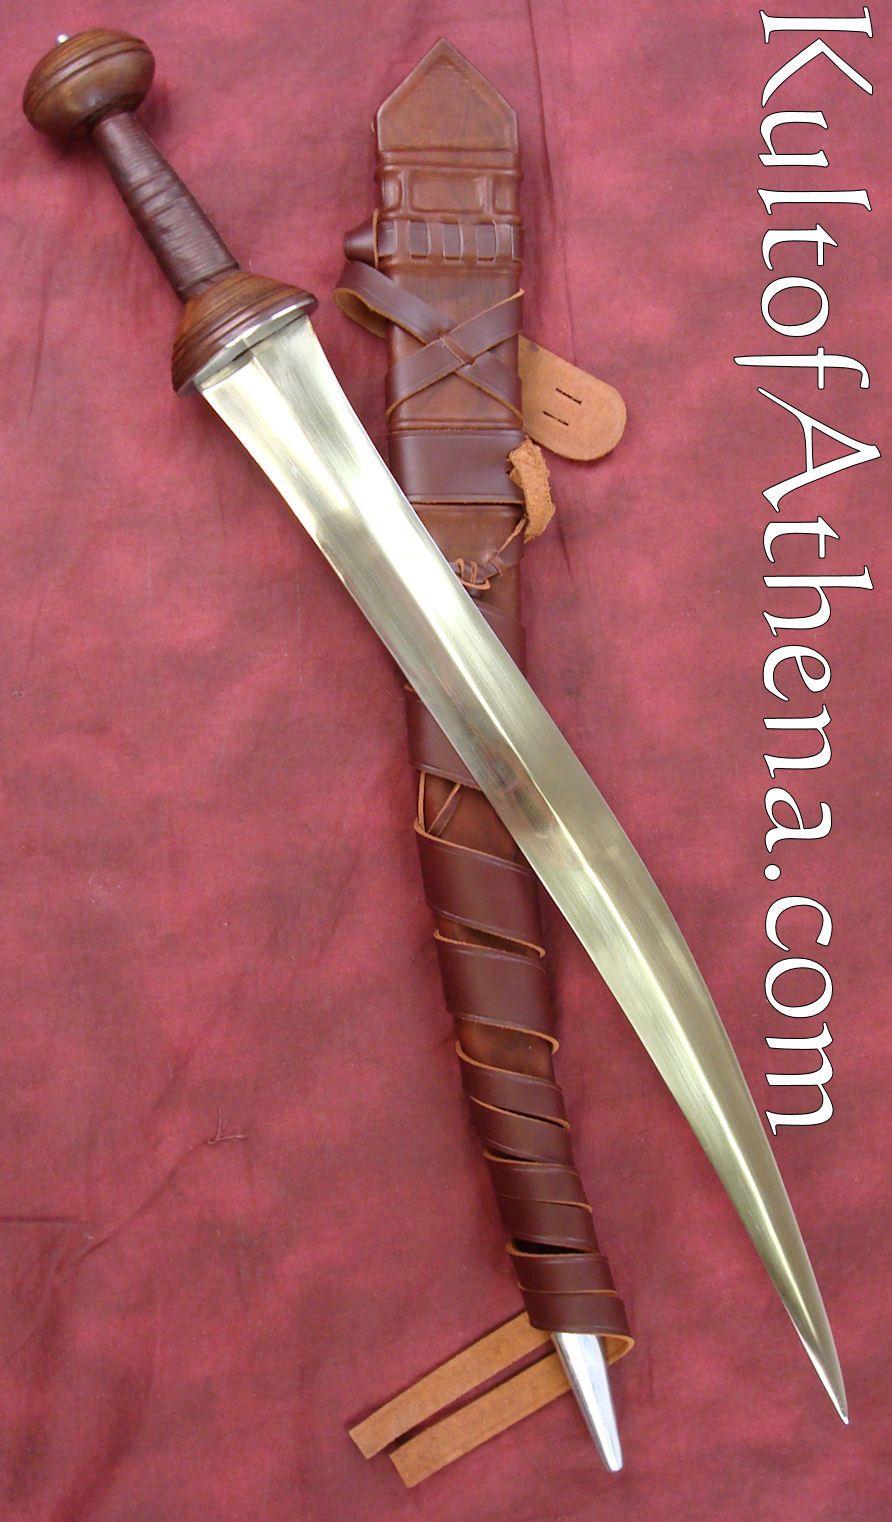 Pin Oleh Anthonie Geyer Di اسلحة حربية قديمة Pedang